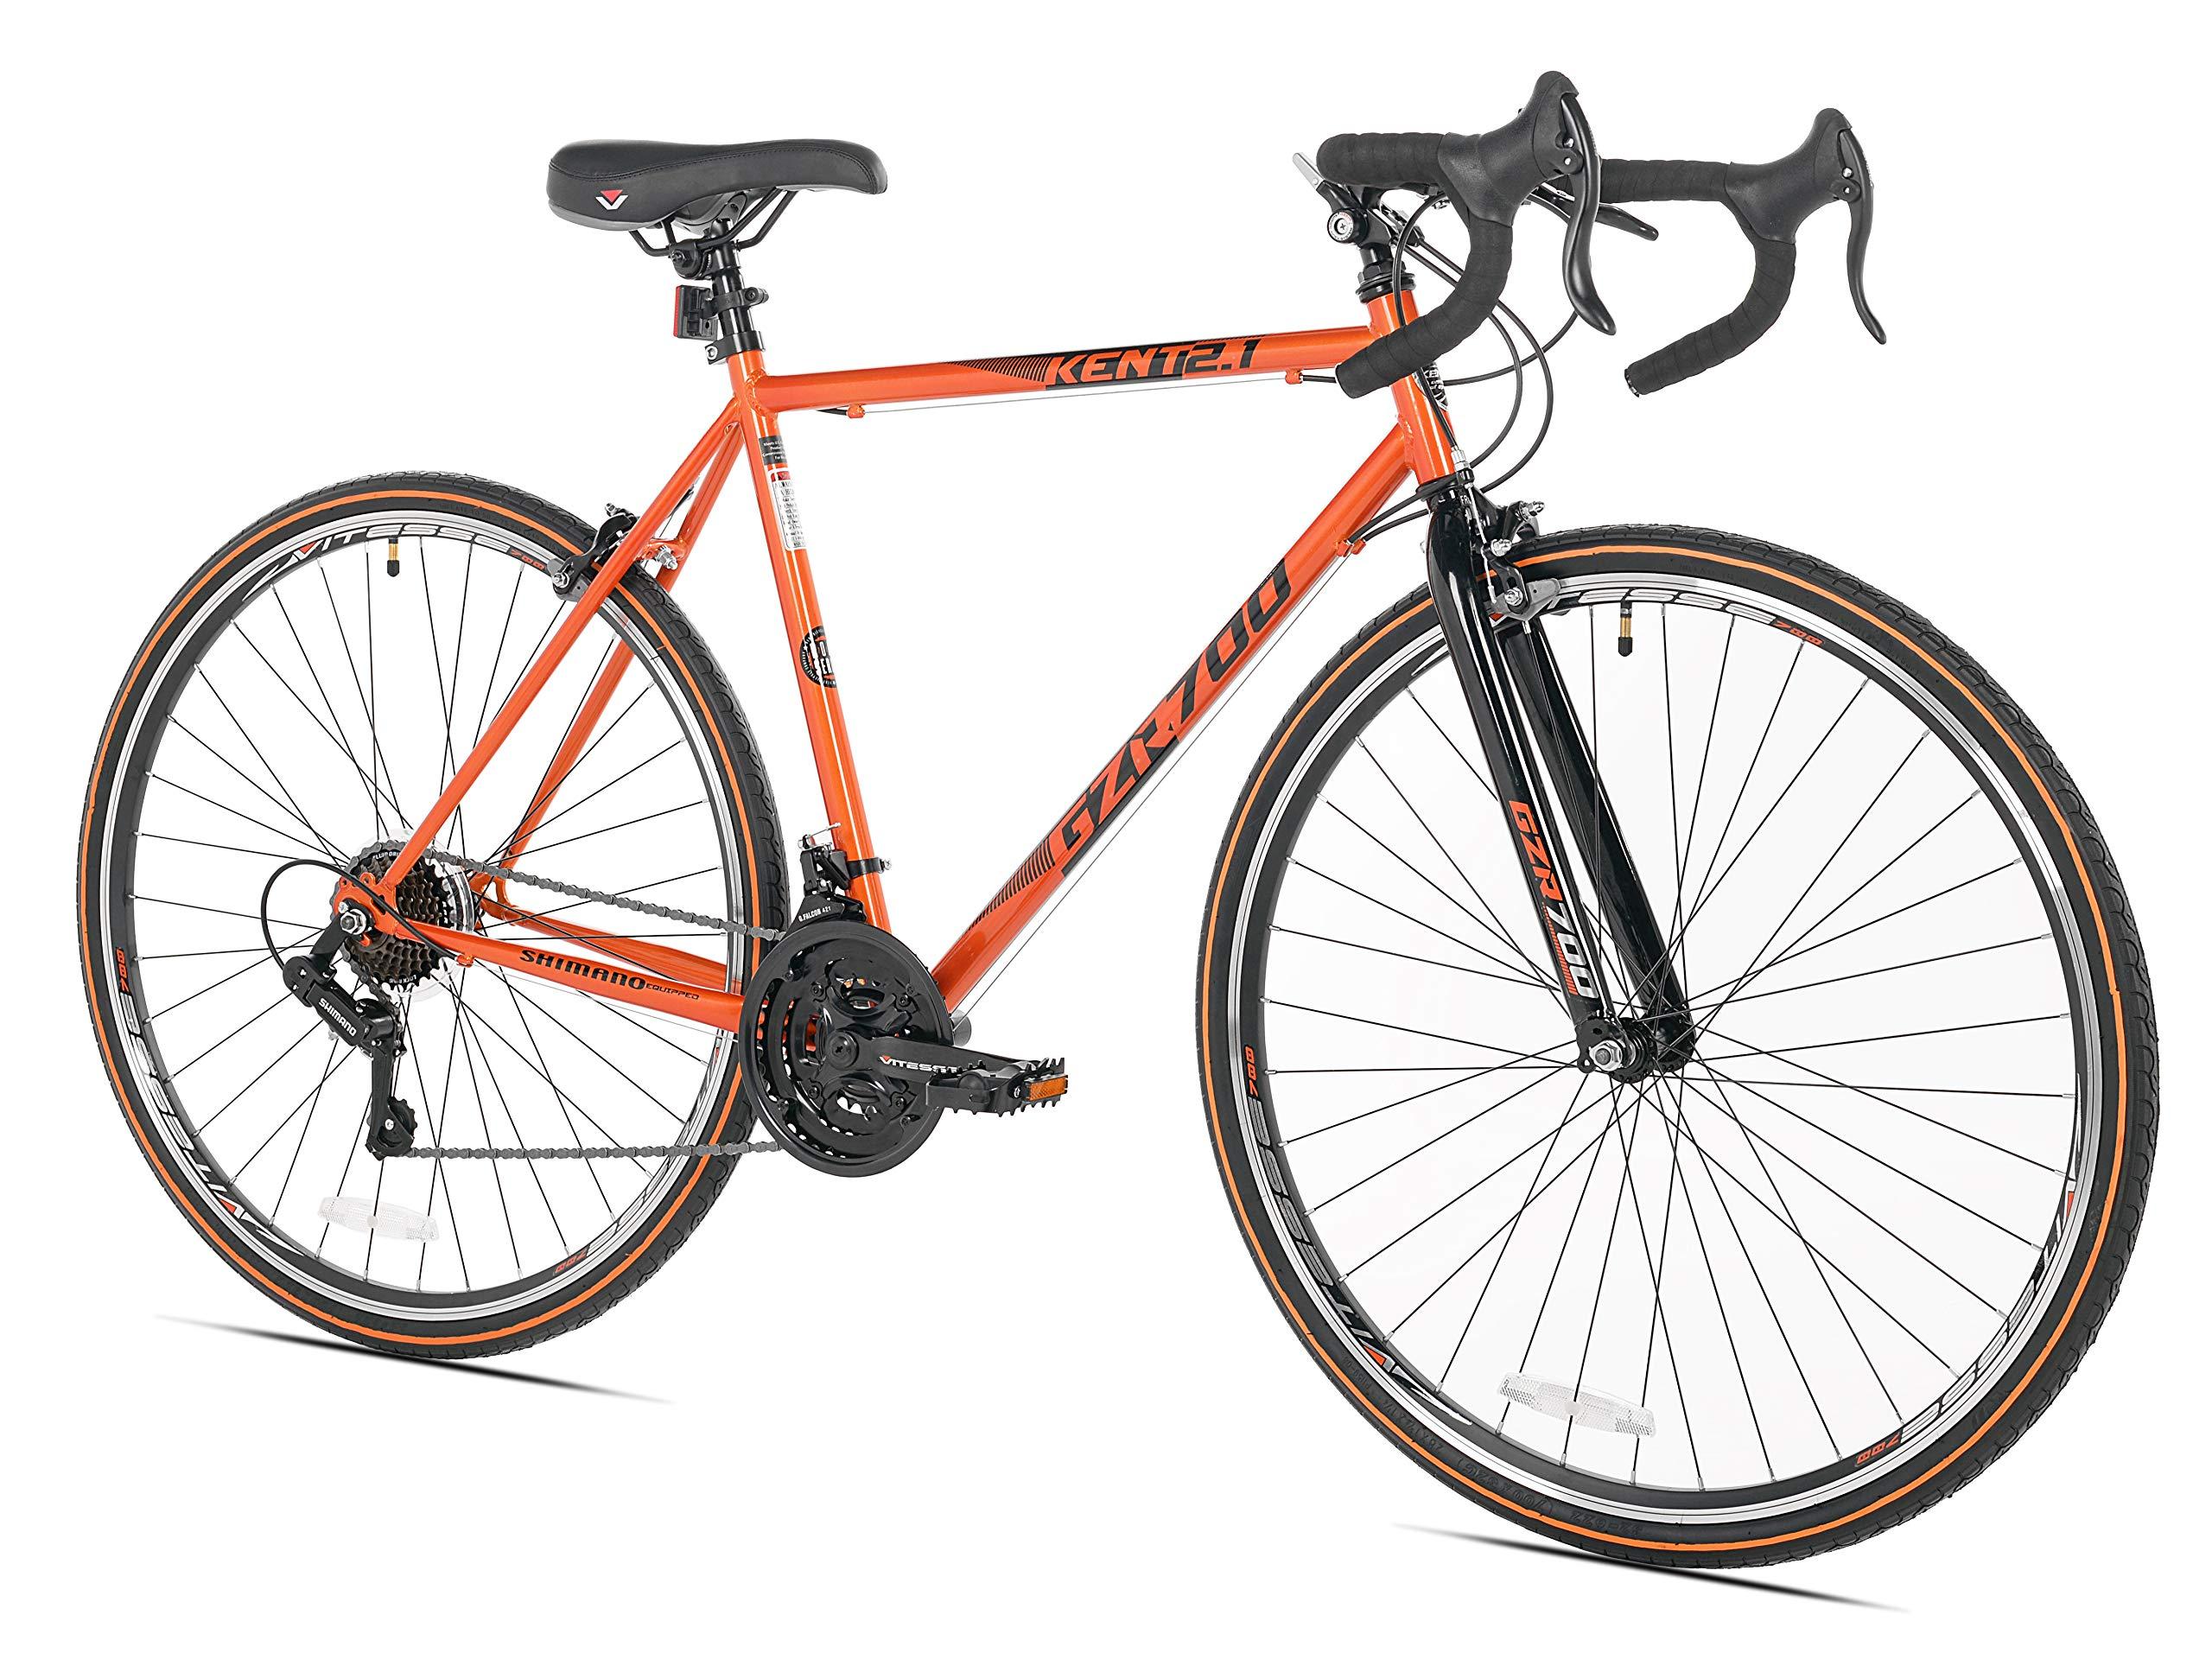 KENT 52716 GZR700 Road Bike